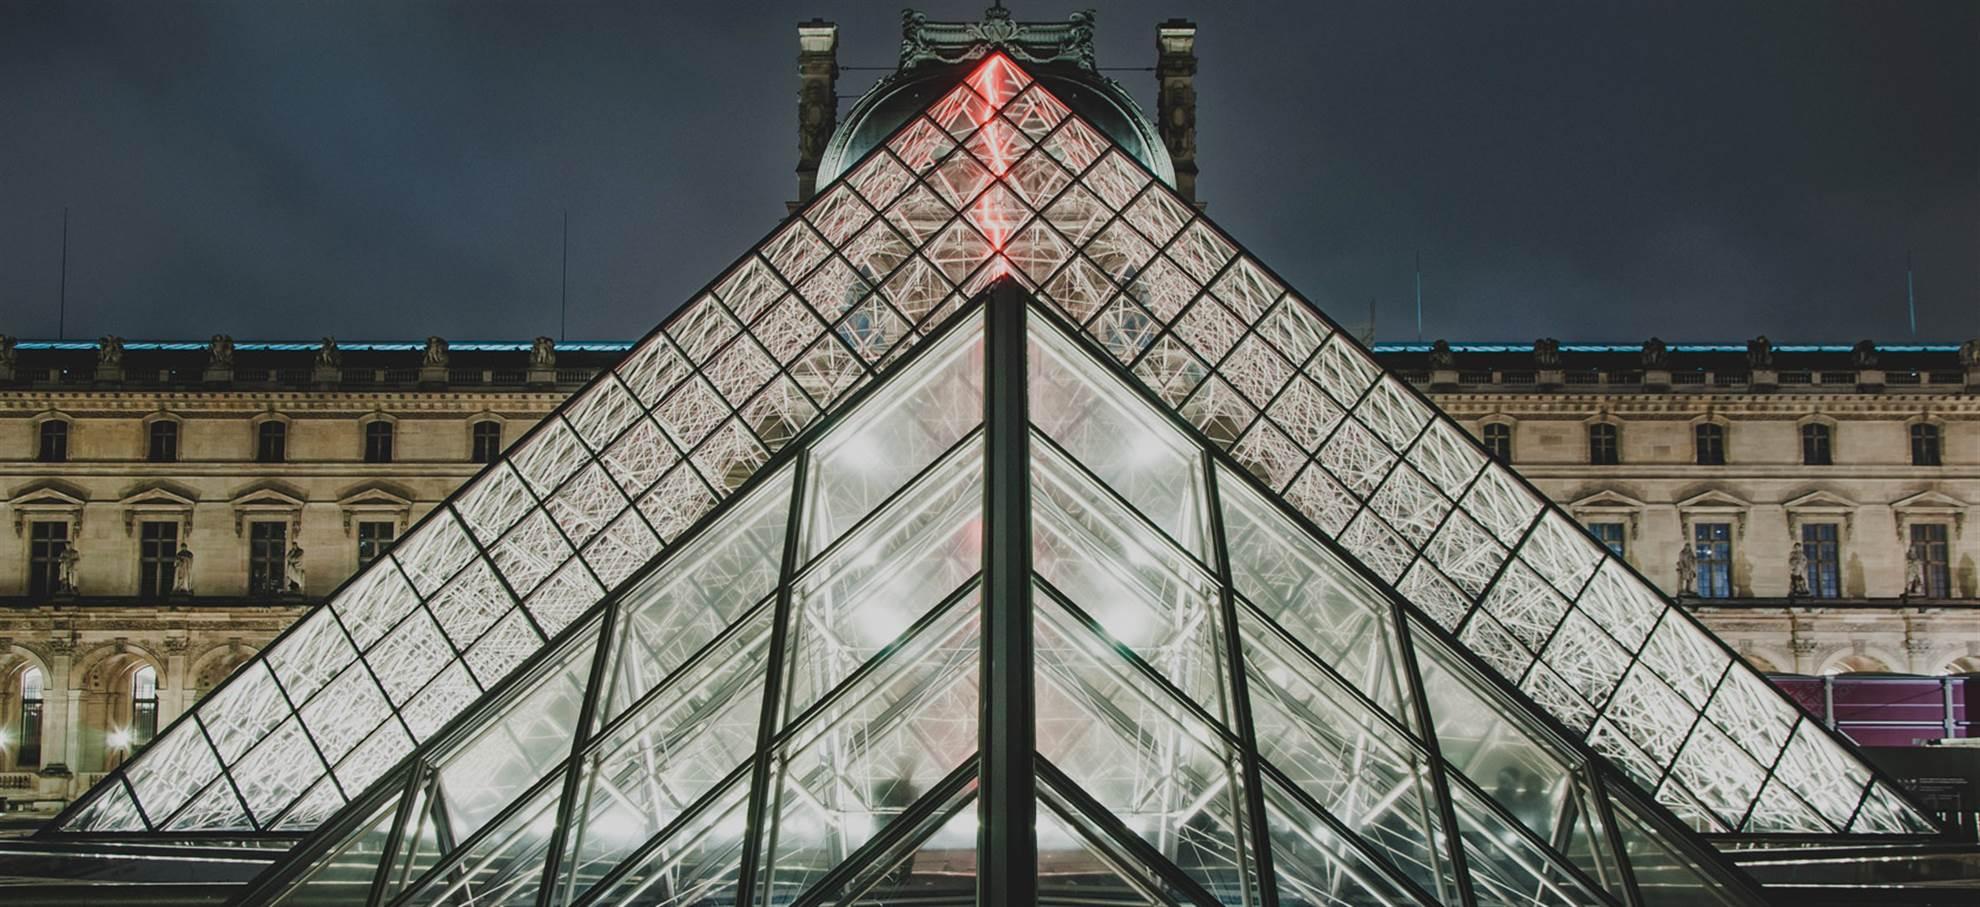 卢浮宫博物馆 (Louvre Museum)